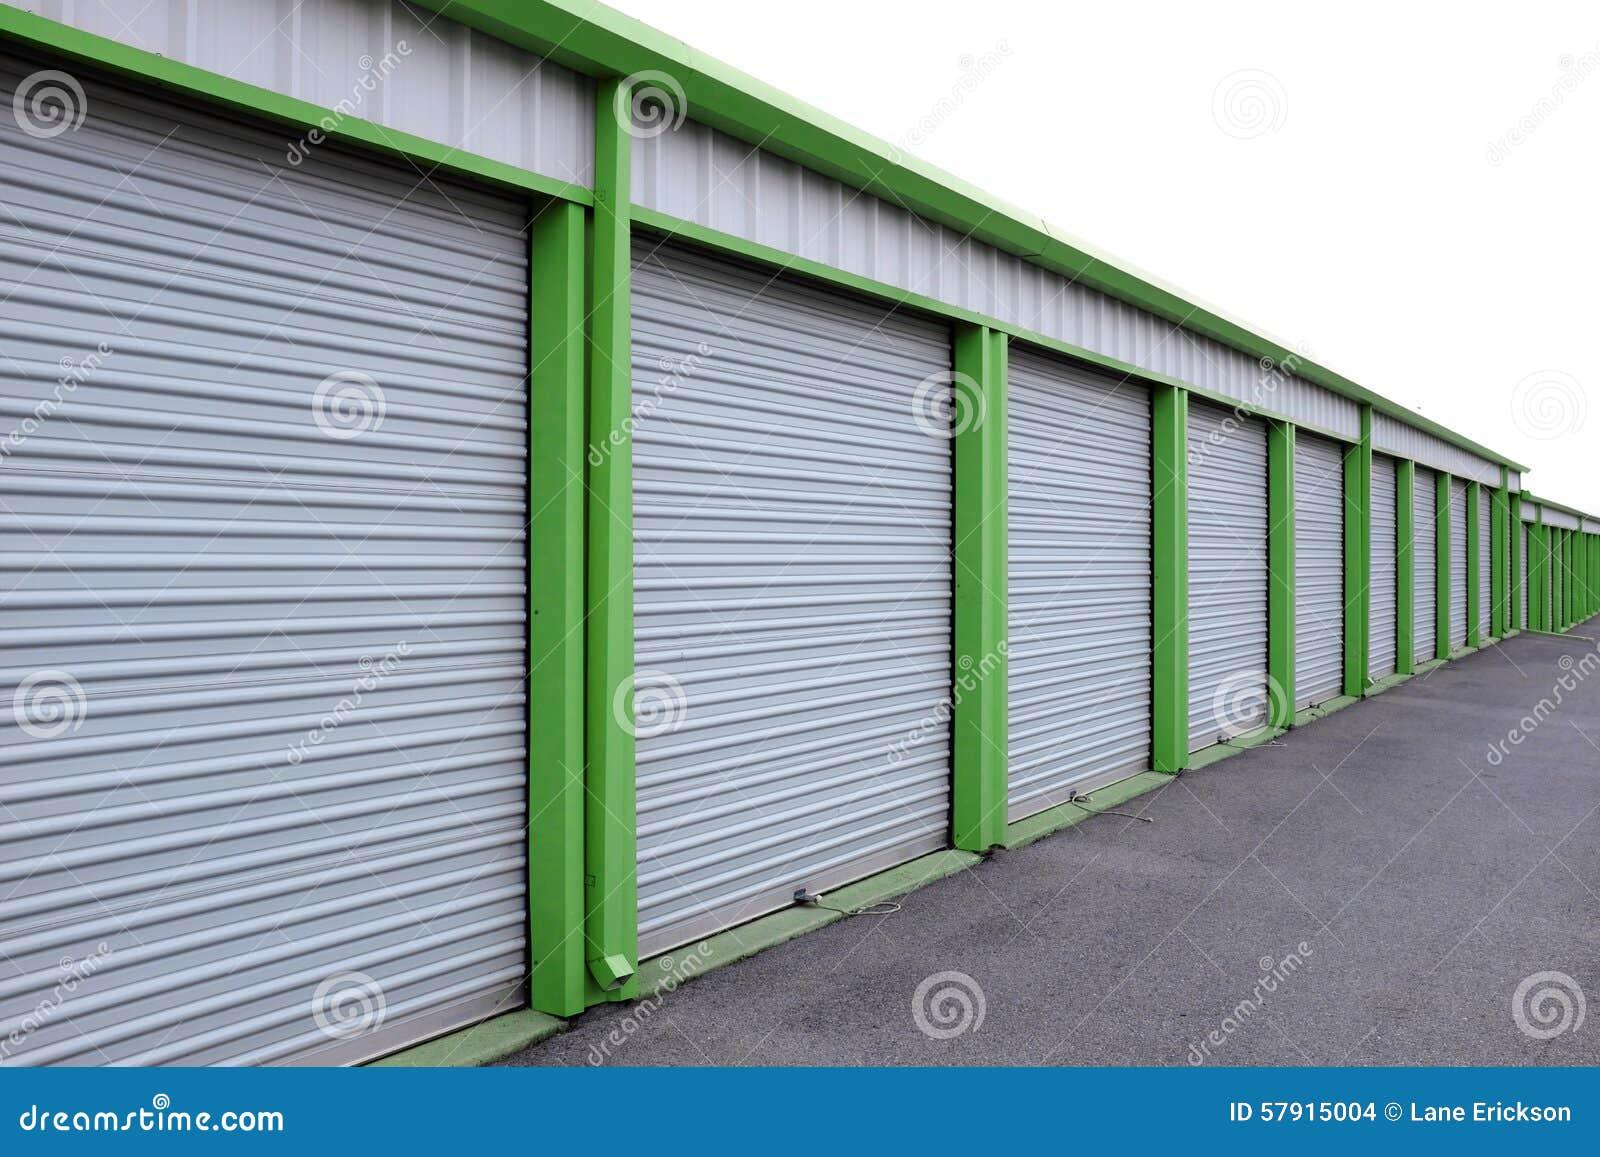 Storage Units With Sliding Doors Stock Photo Image Of Building